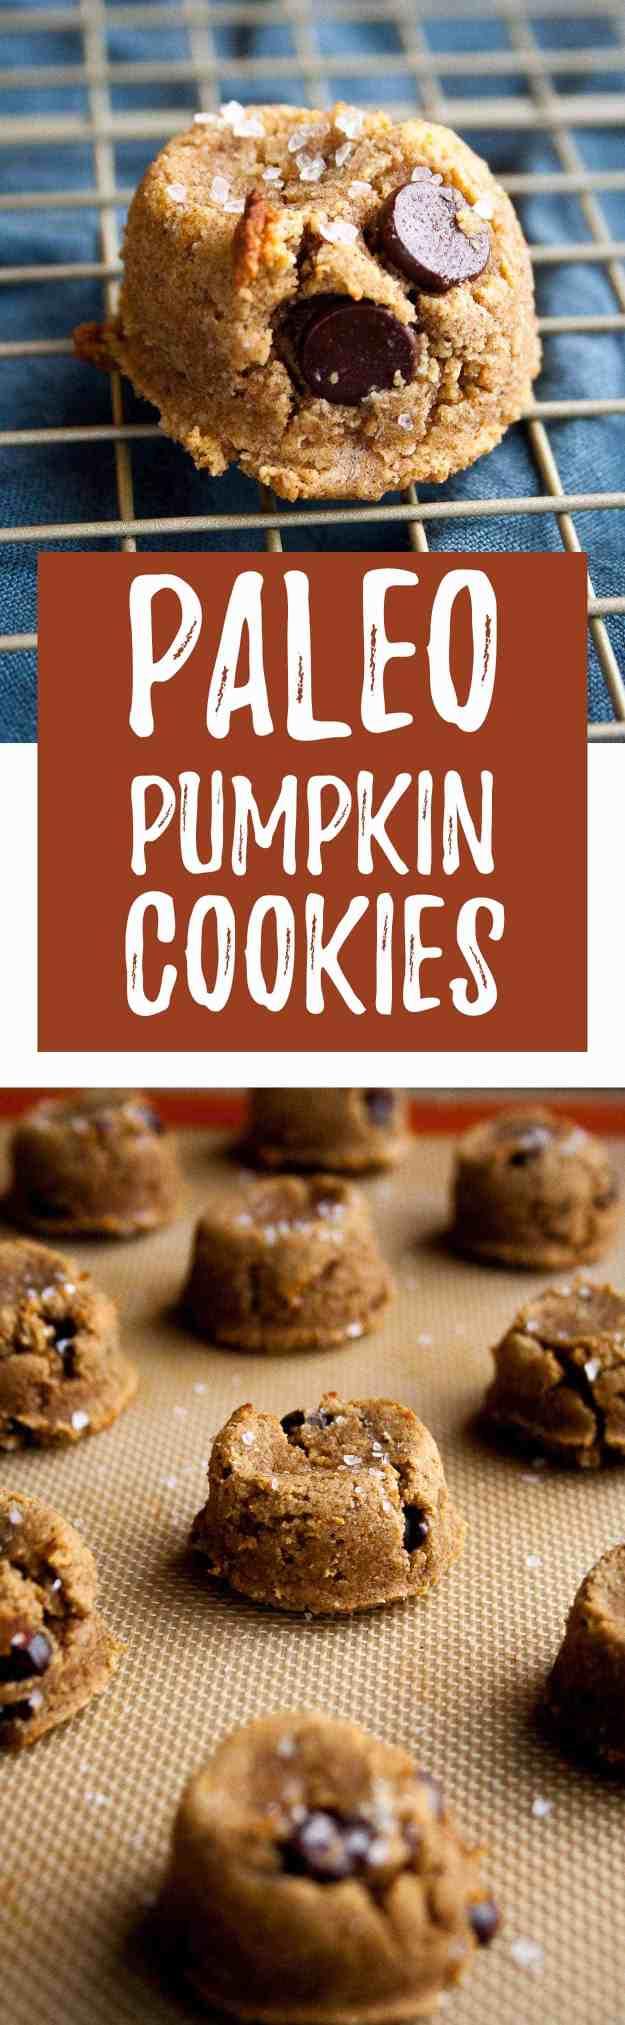 Paleo Pumpkin Cookies with Dark Chocolate Chips   pumpkin recipes, coconut flour, almond flour, maple syrup, gluten free, diary free, grain free, easy, pumpkin spice, fall, baking   hungrybynature.com